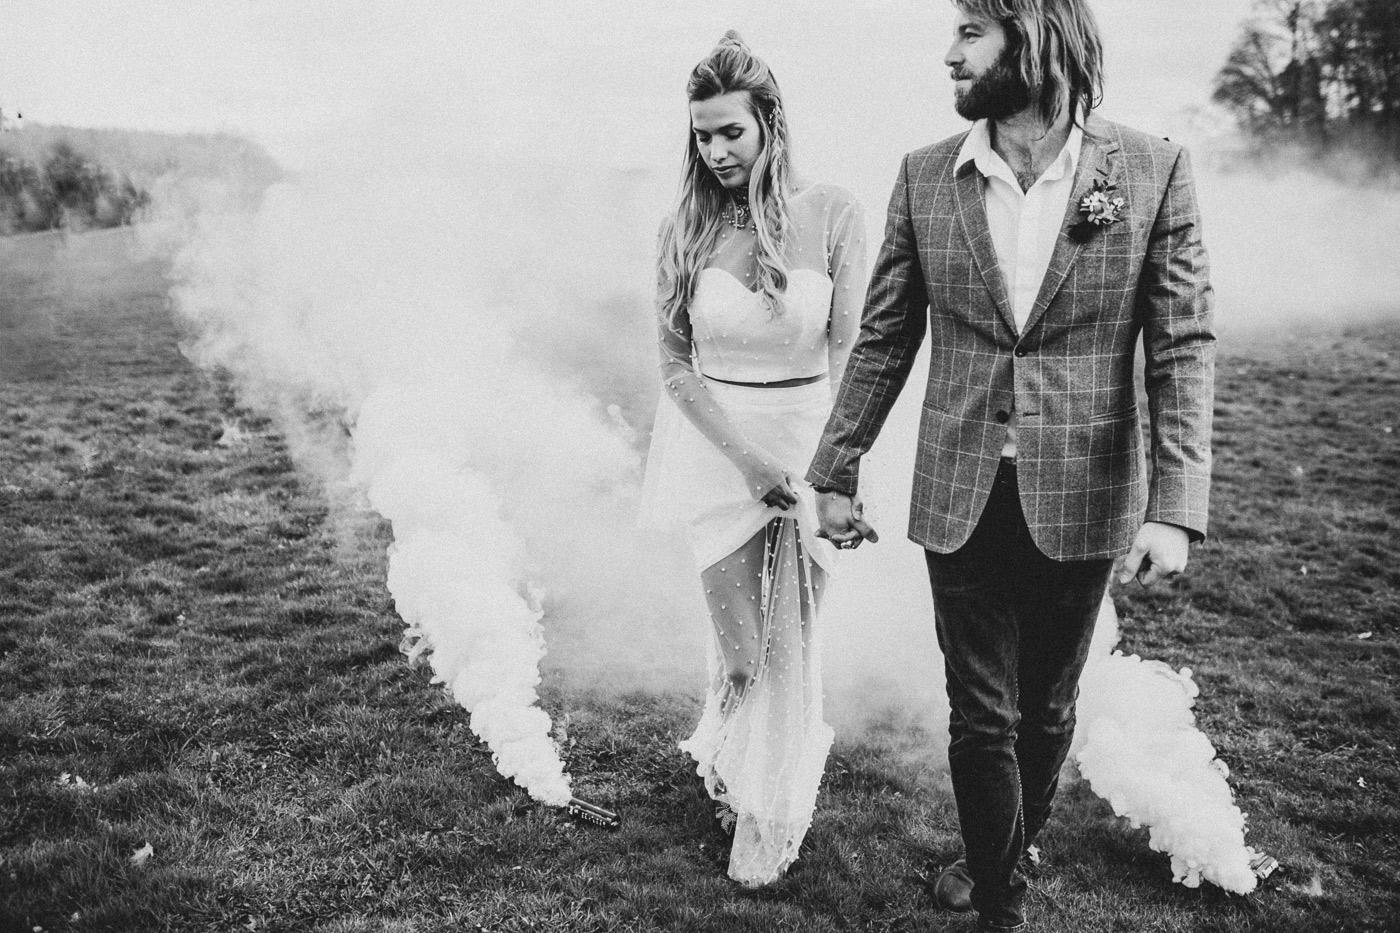 alternative-scotland-wedding-photographer-Epic-Love-Story-005.jpg